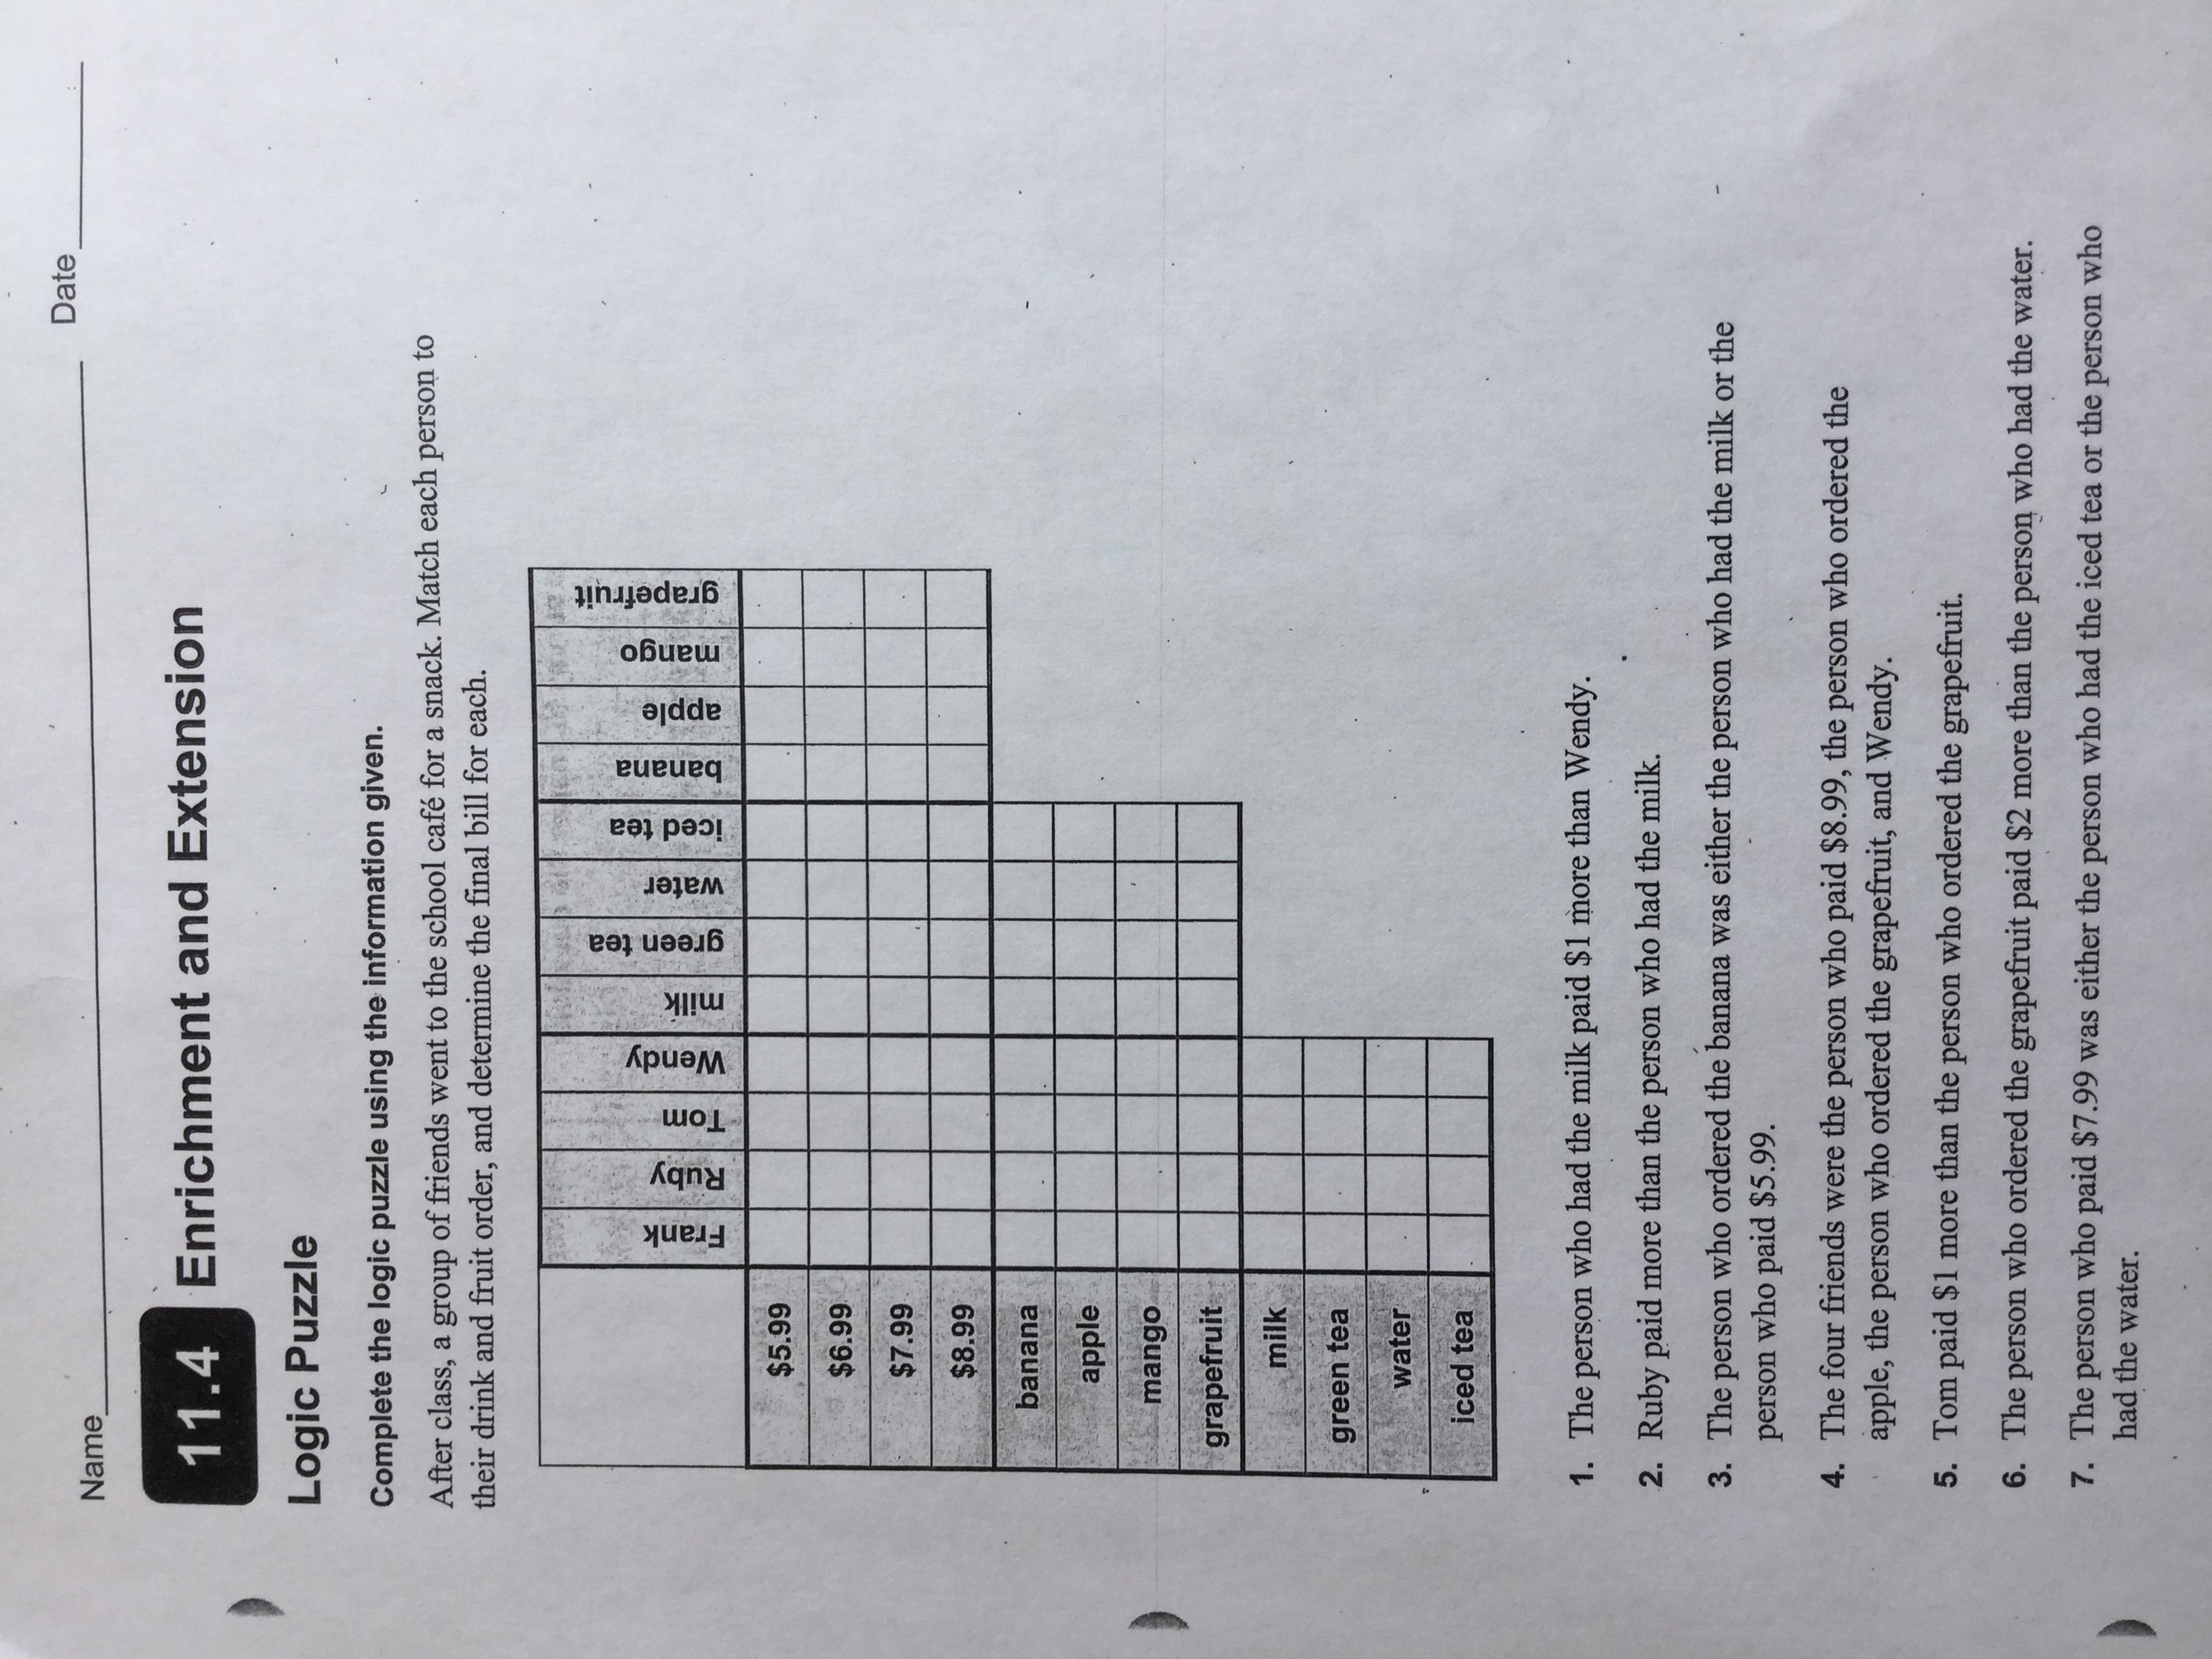 Comfortable Www Mathfactcafe Com Photos - Math Worksheets - modopol.com